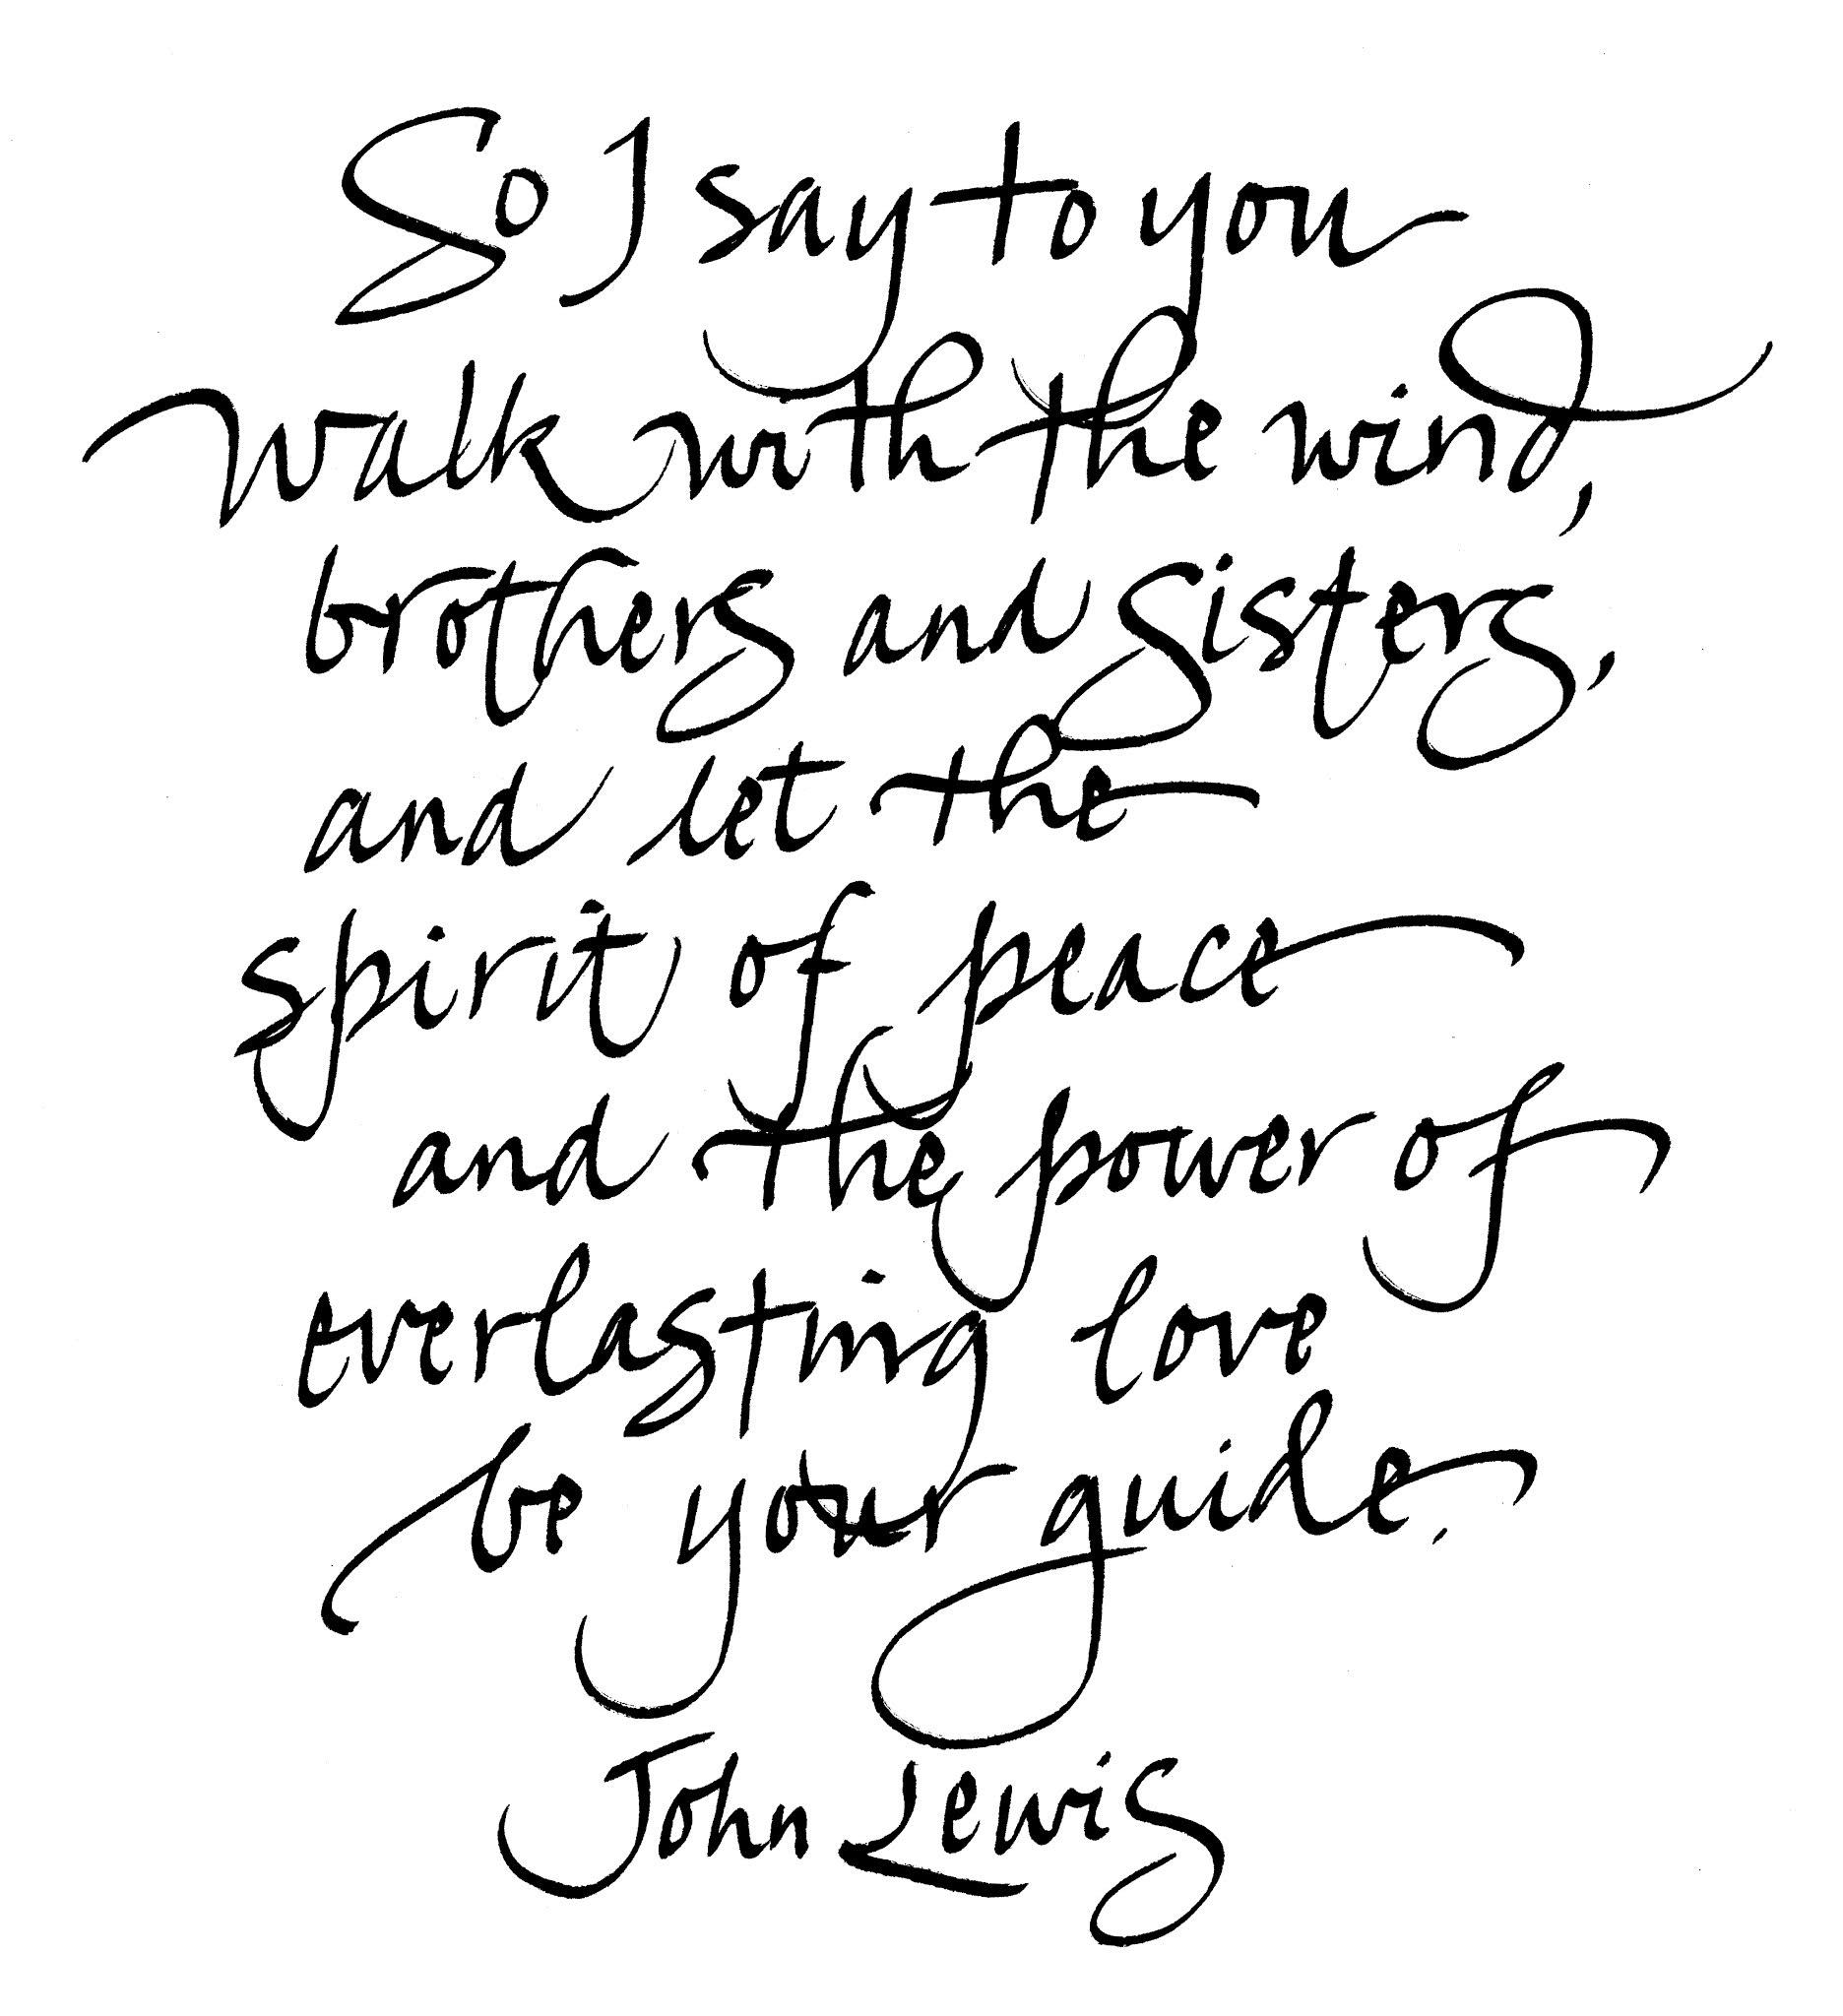 susangaylord.com: For John Lewis